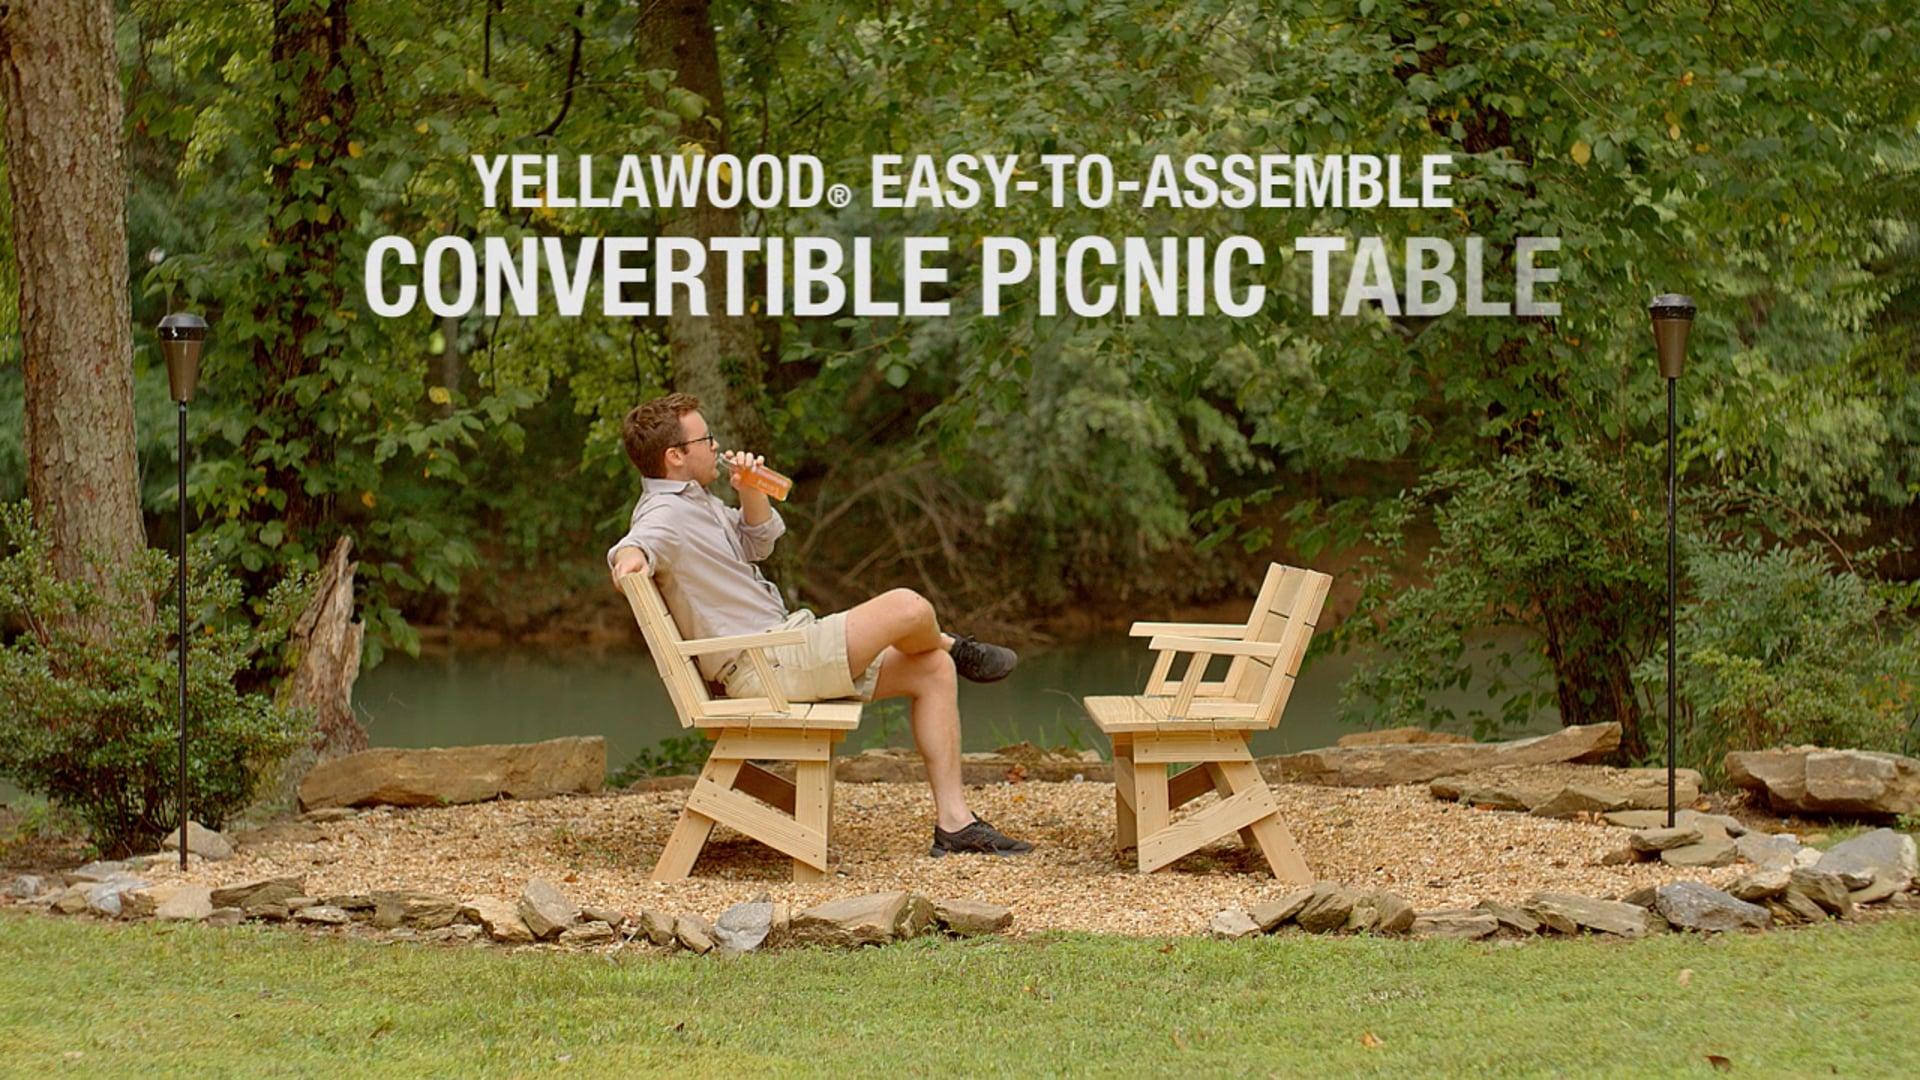 Convertible Picnic Table